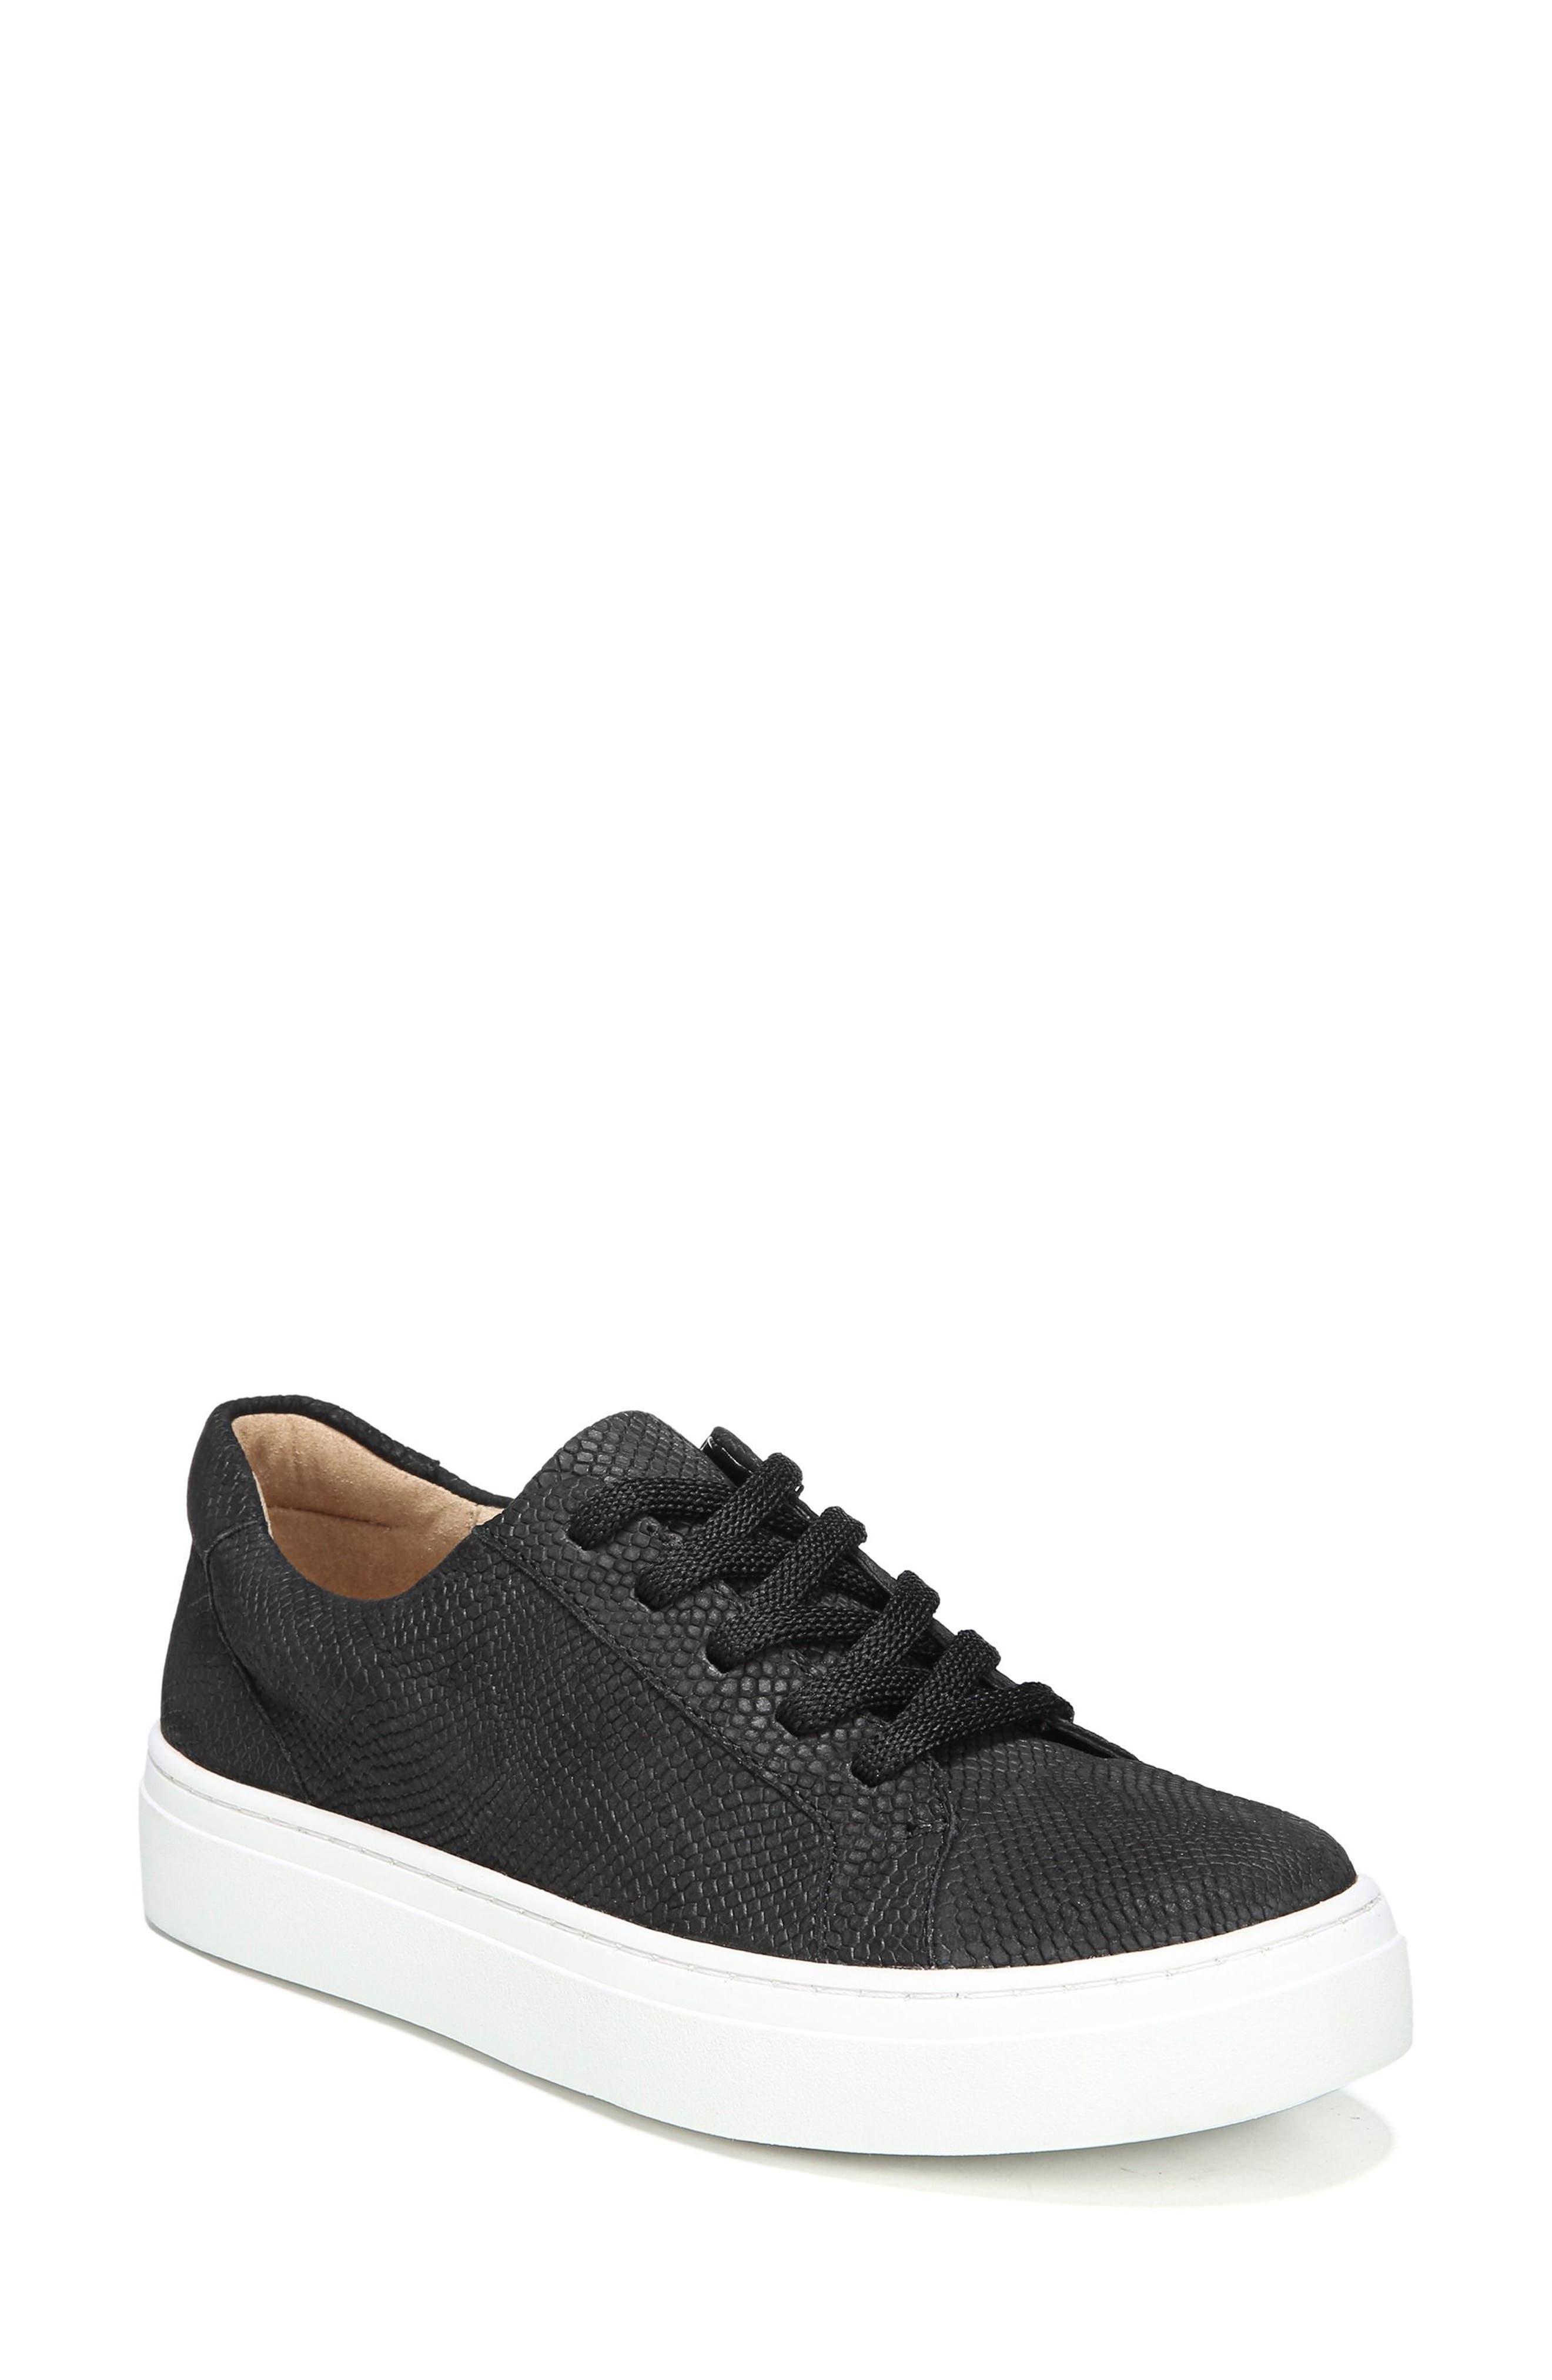 Cairo Sneaker,                             Main thumbnail 1, color,                             001